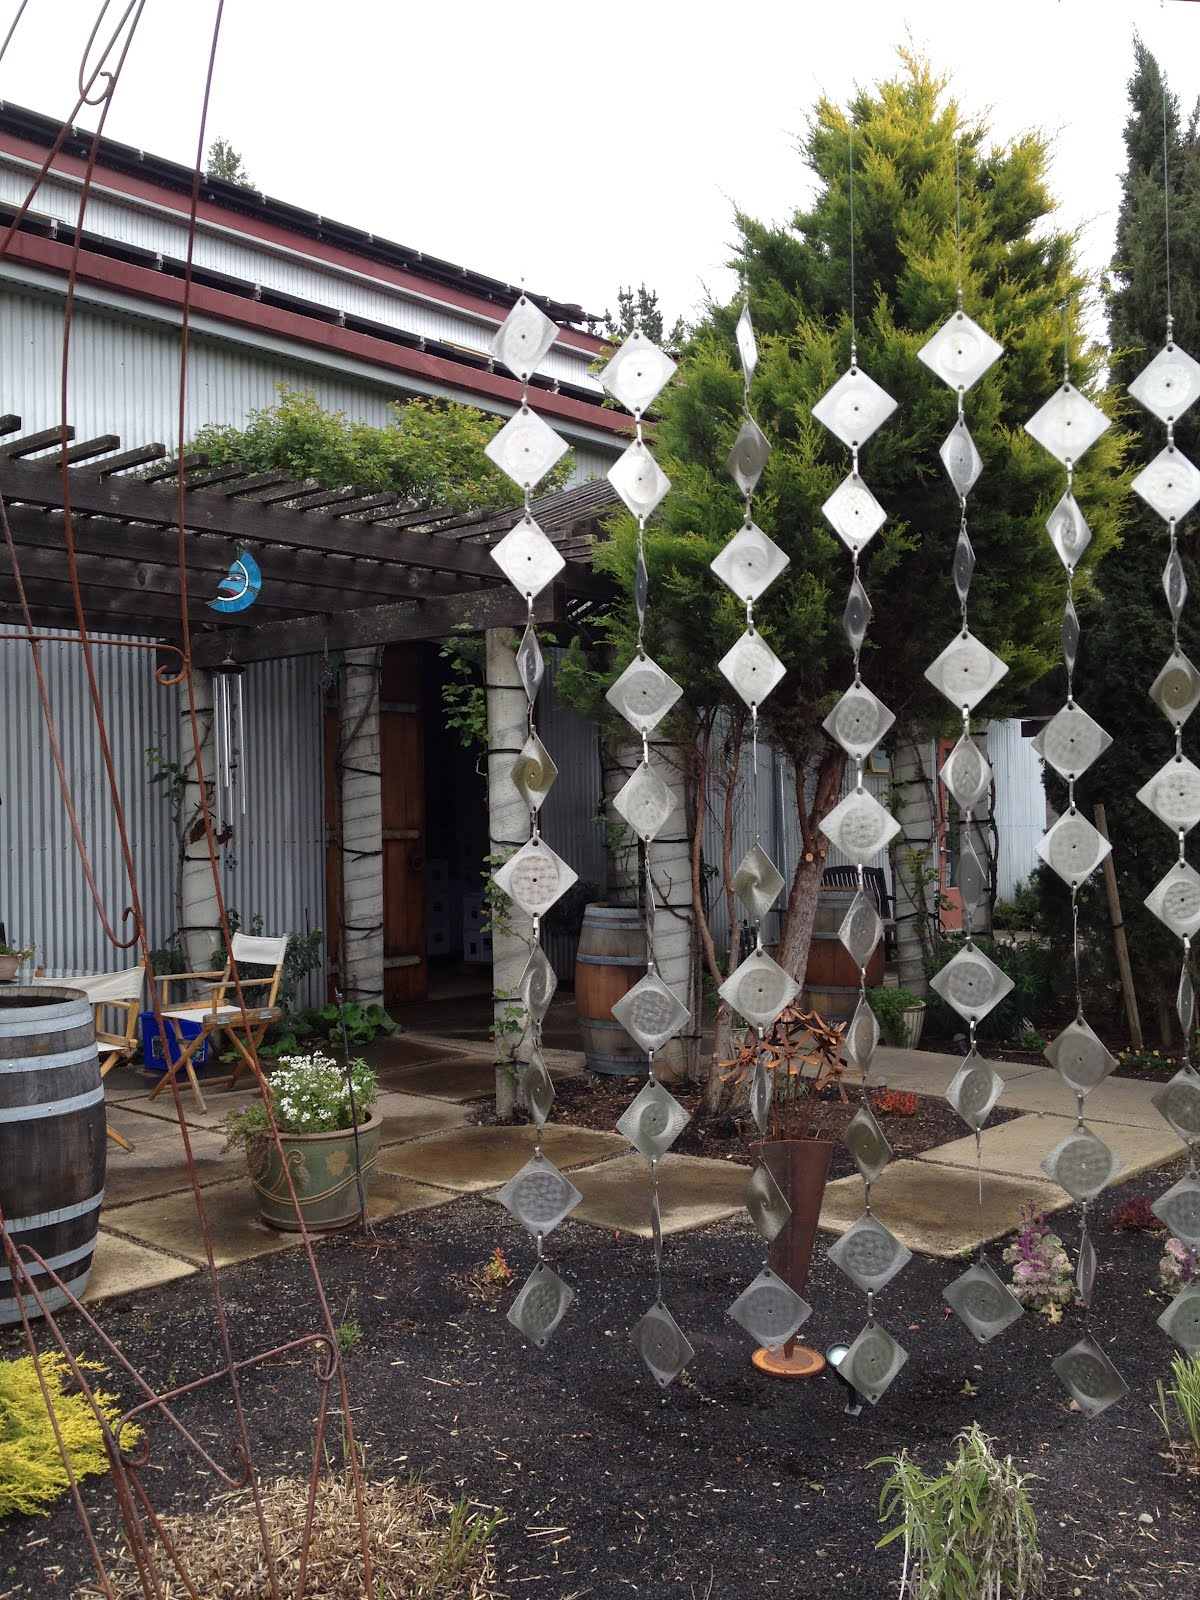 HAGAFEN CELLARS WINERY of NAPA VALLEY & Malka Out Of The Closet: HAGAFEN CELLARS WINERY - NAPA CALIFORNIA